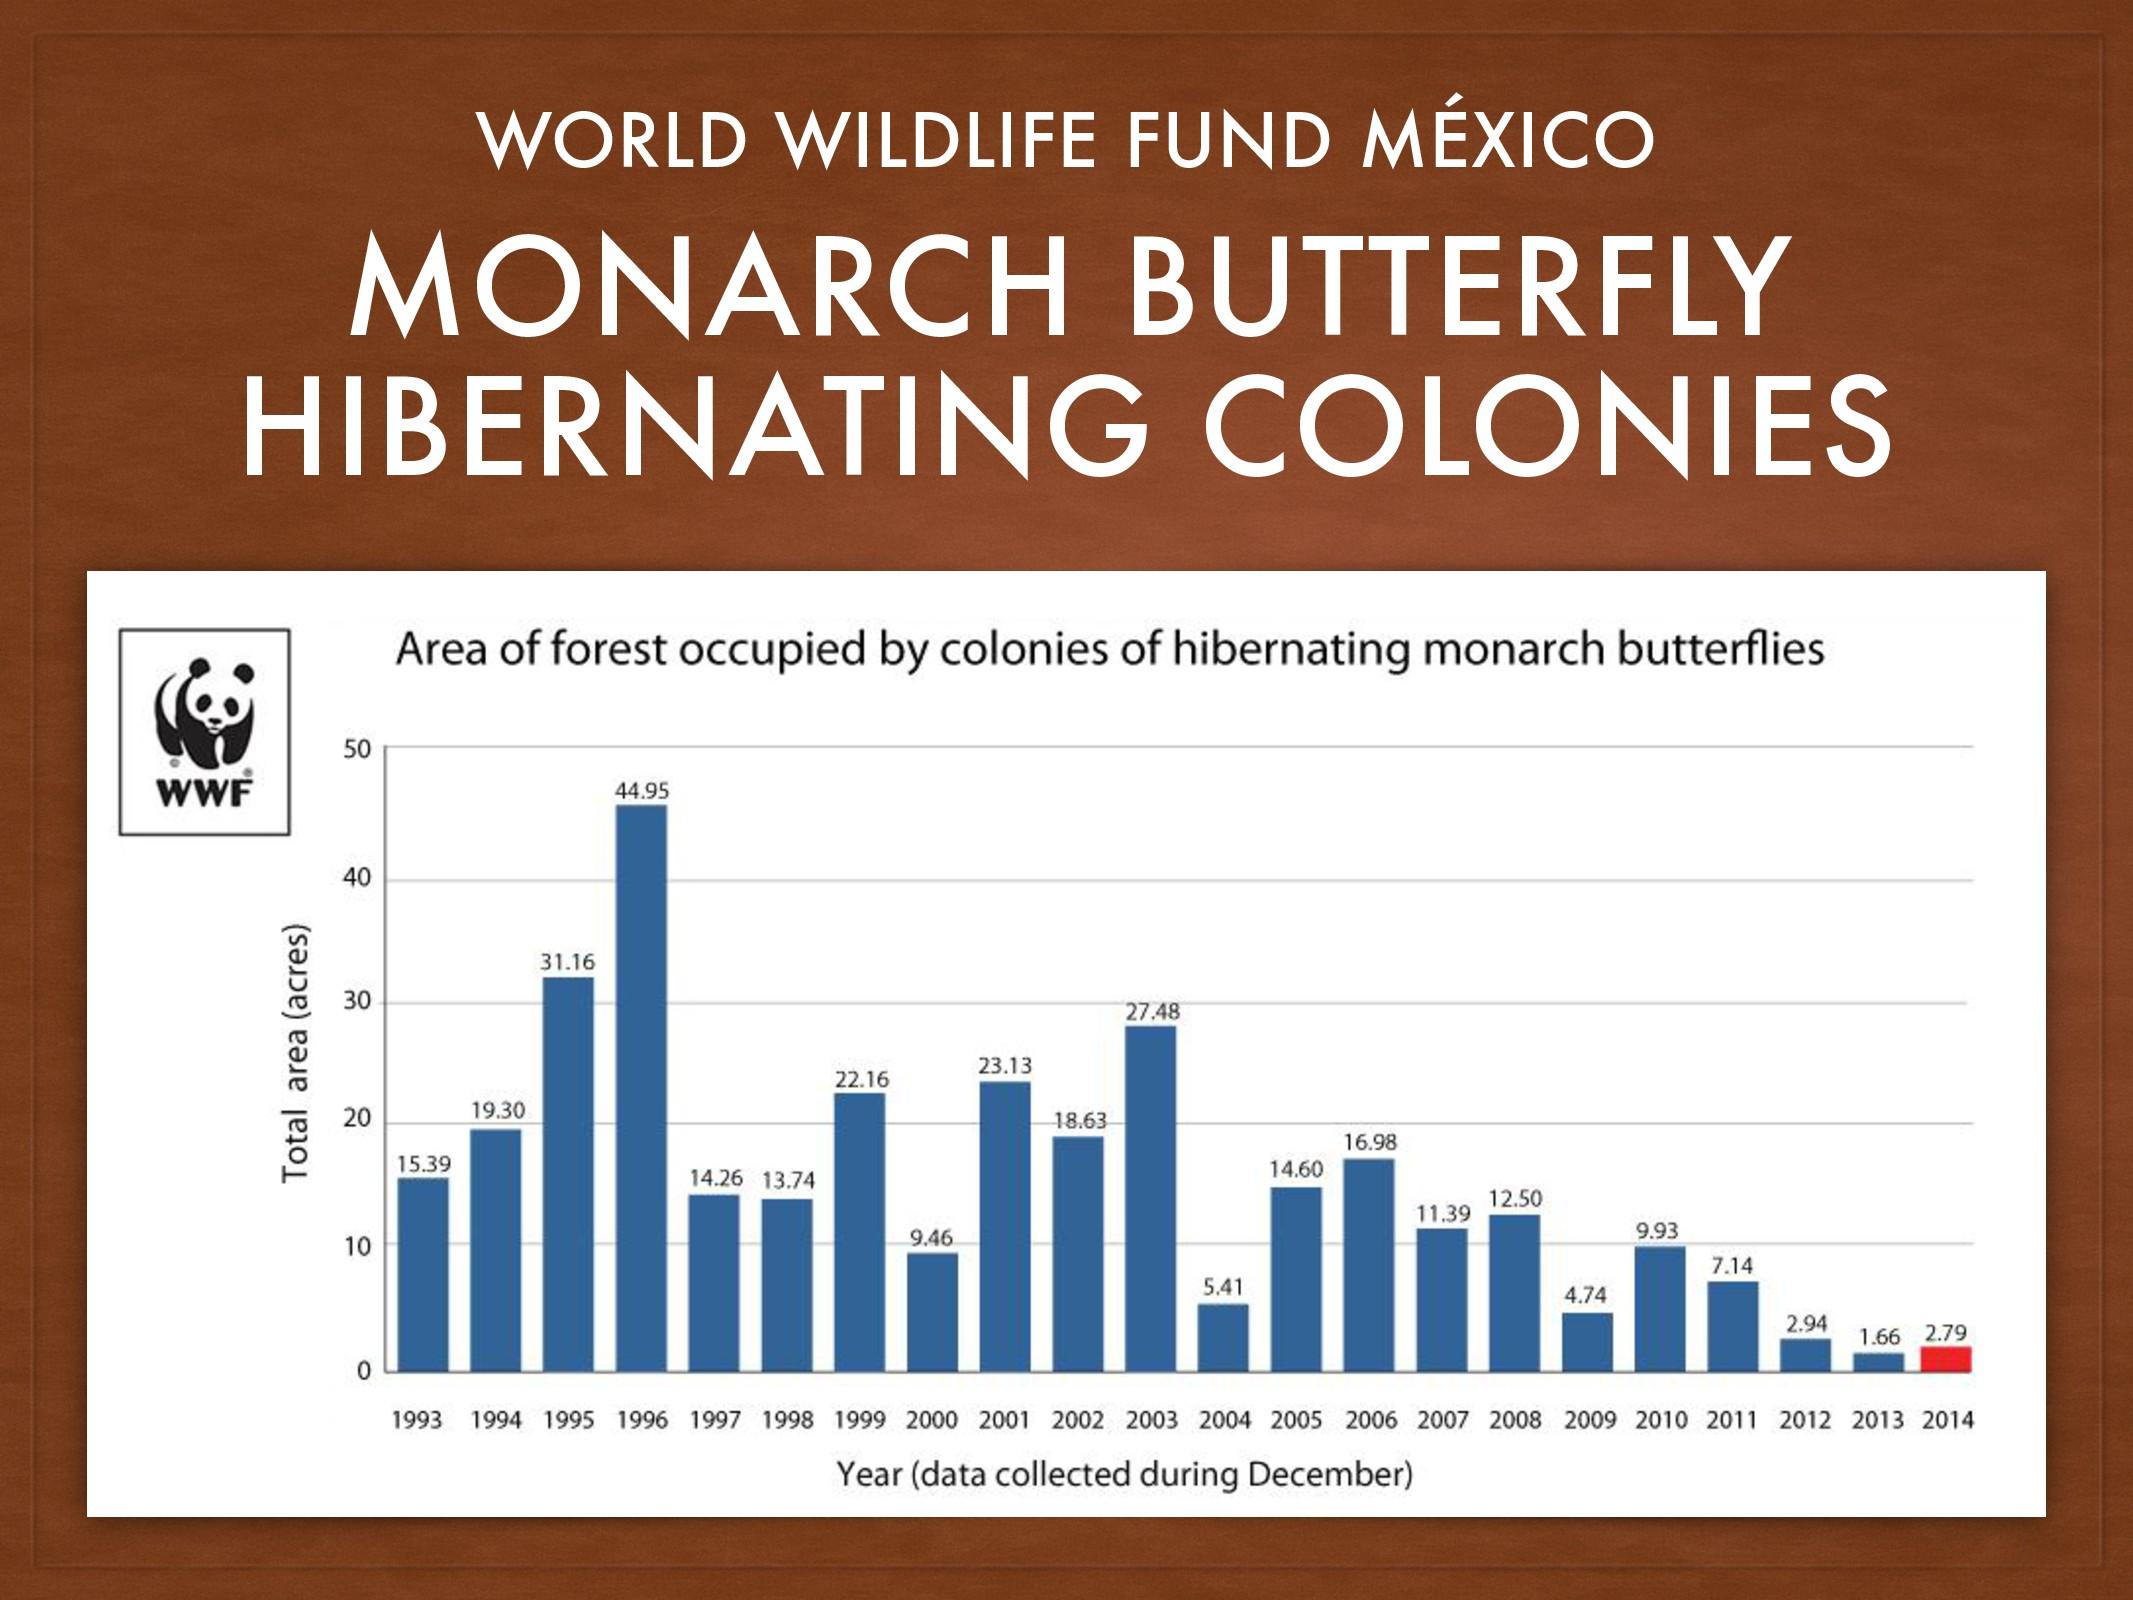 MONARCH BUTTERFLY HIBERNATING COLONIES WORLD WI...